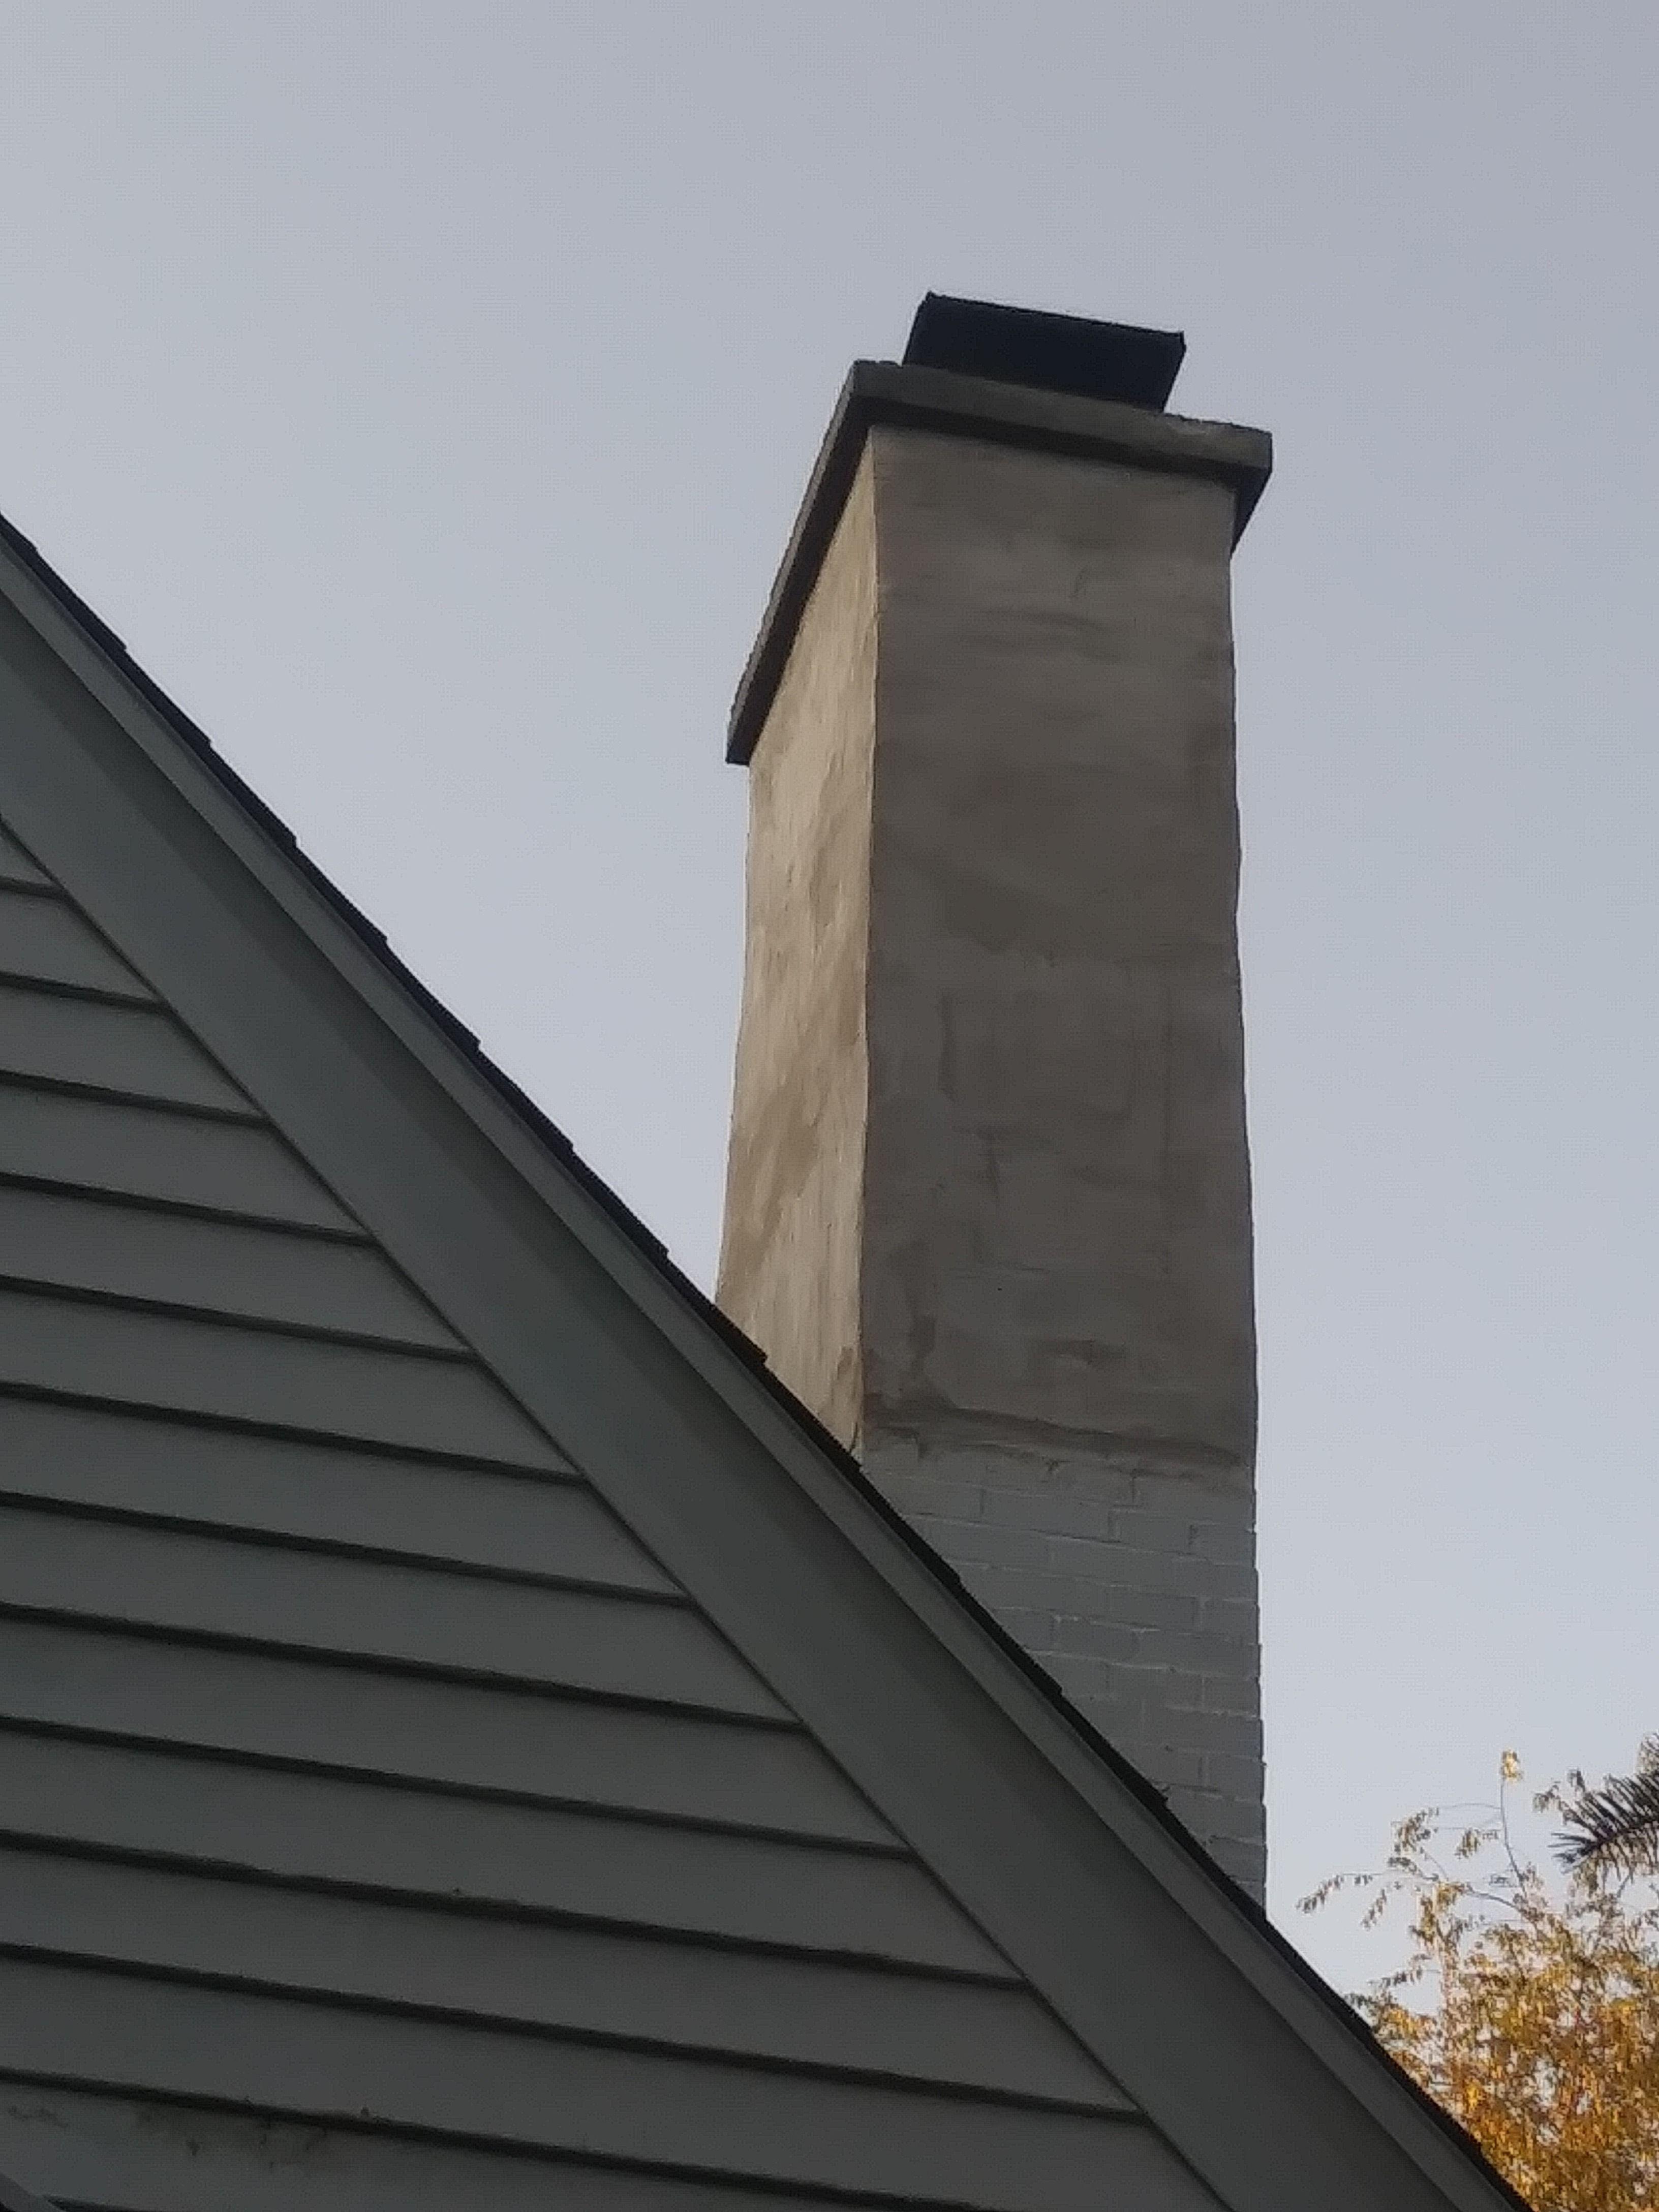 Chimney Brick Repair Brick Fire Pit Paver Patio